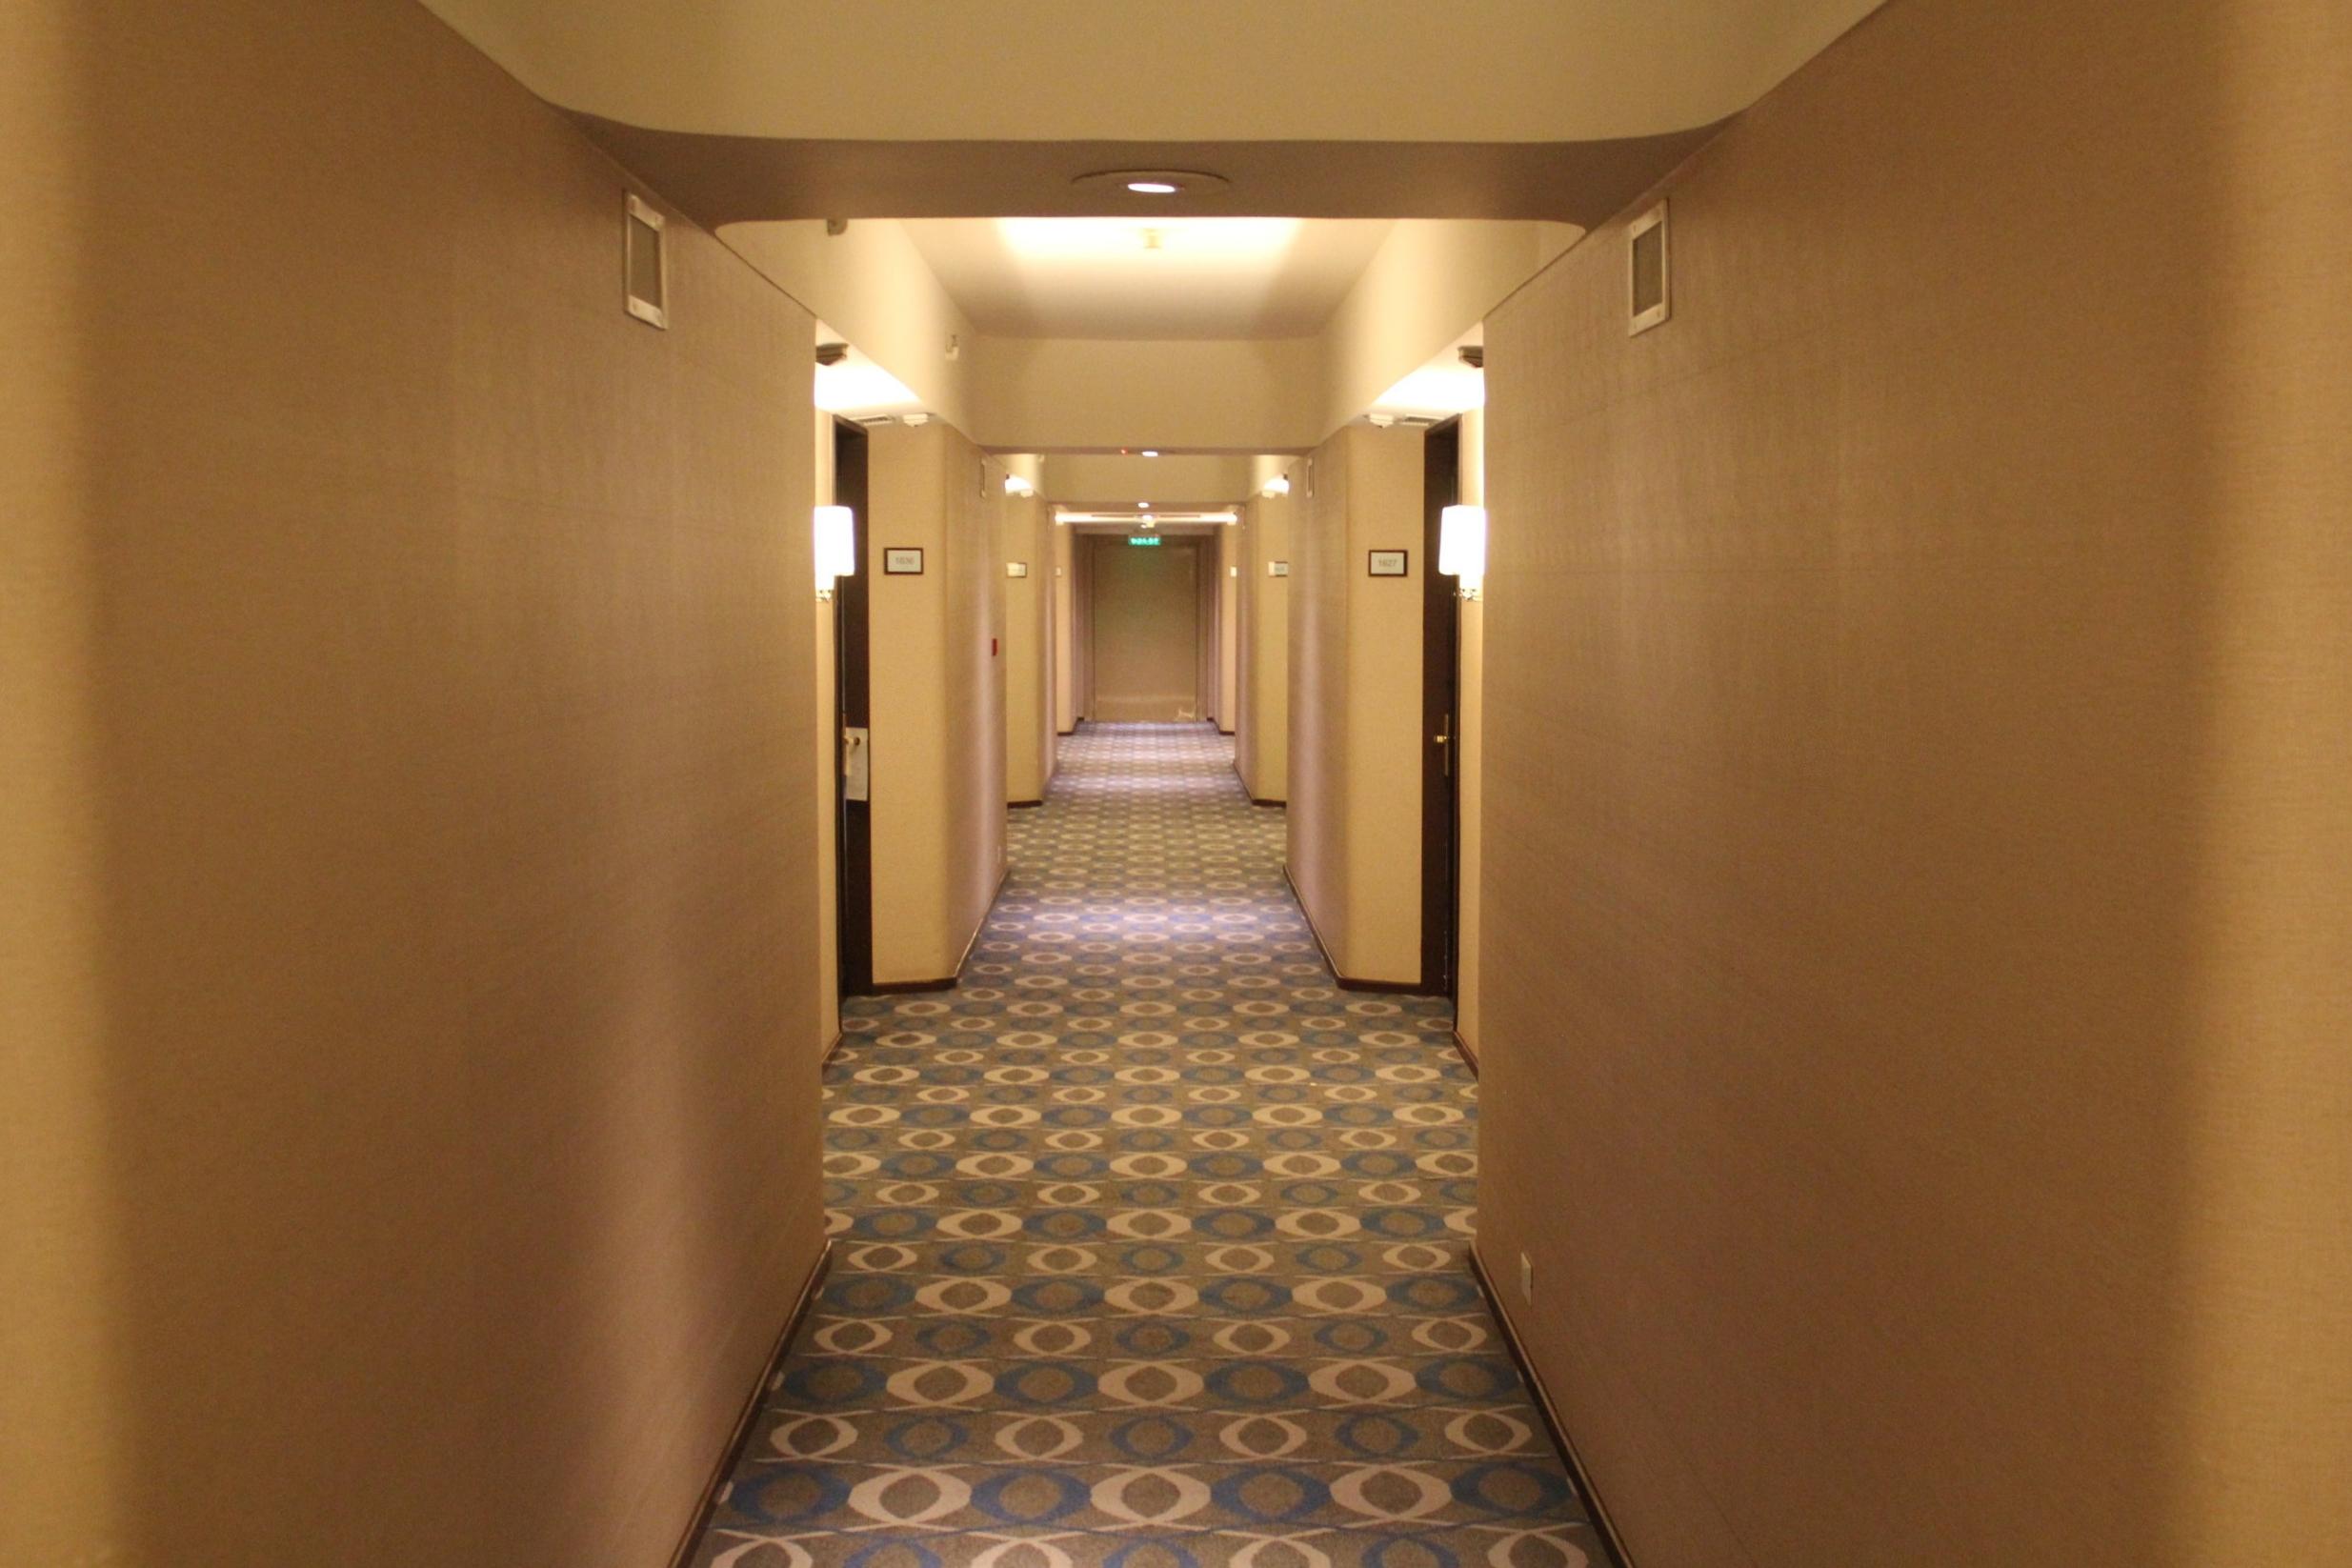 Sheraton Buenos Aires – Hallway